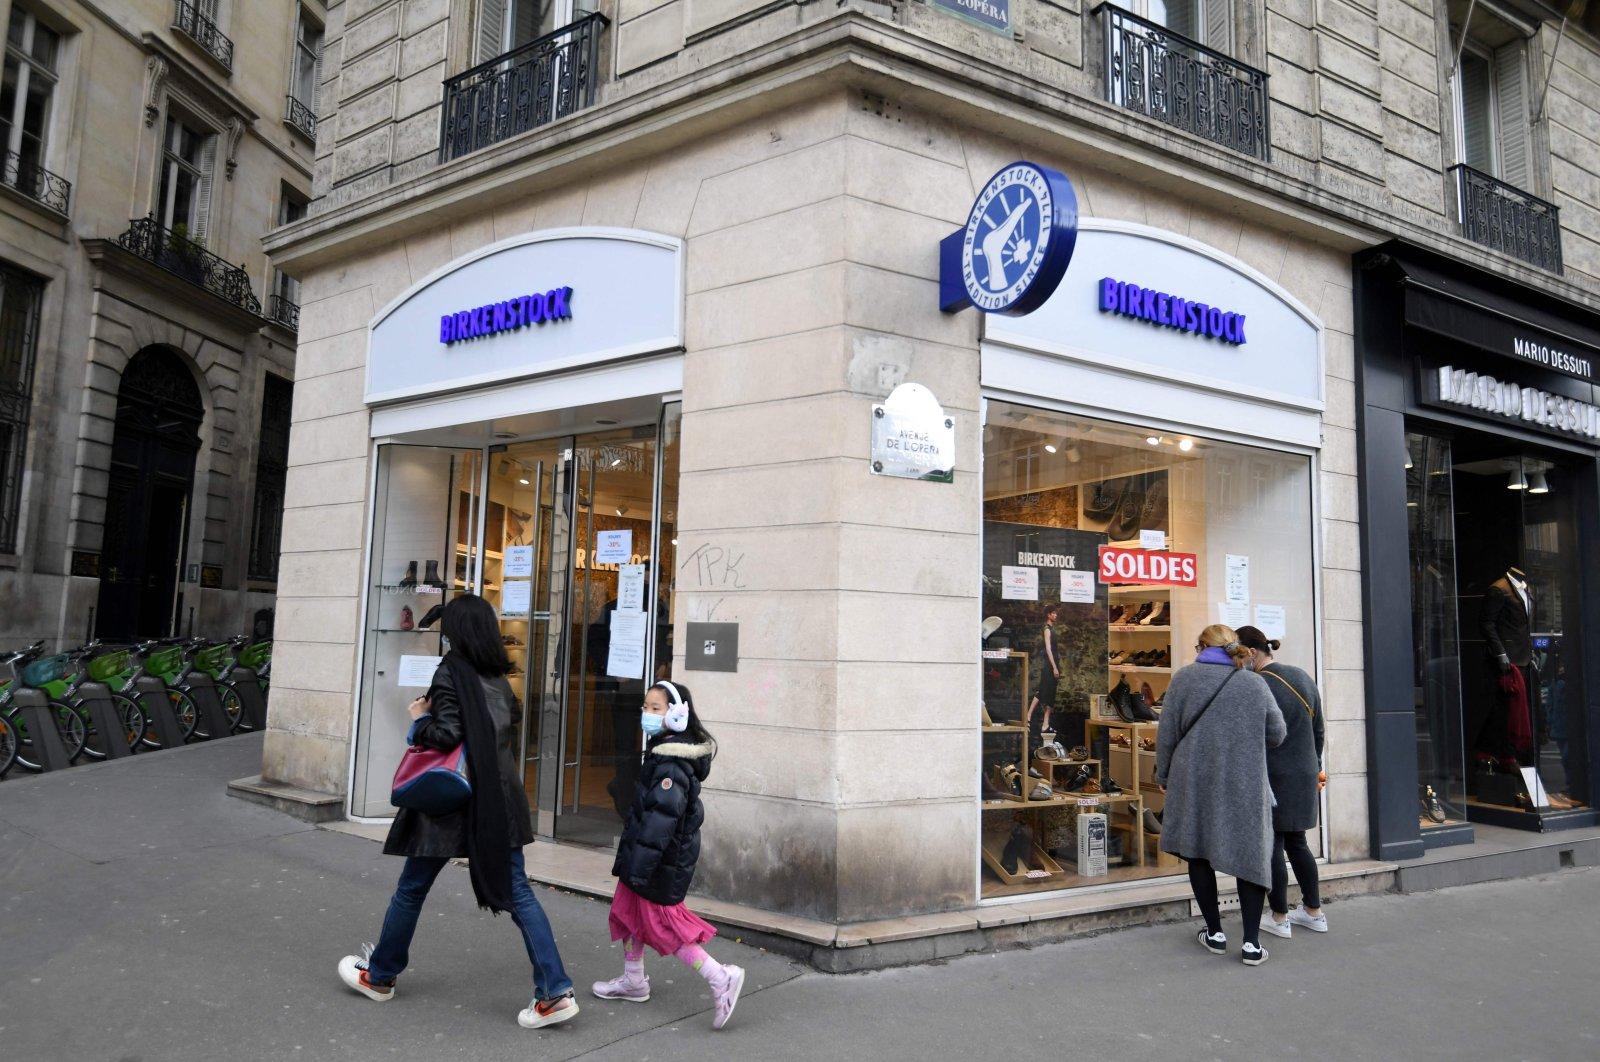 Pedestrians walk past a Birkenstock outlet in Paris, France, Feb. 26, 2021. (AFP Photo)